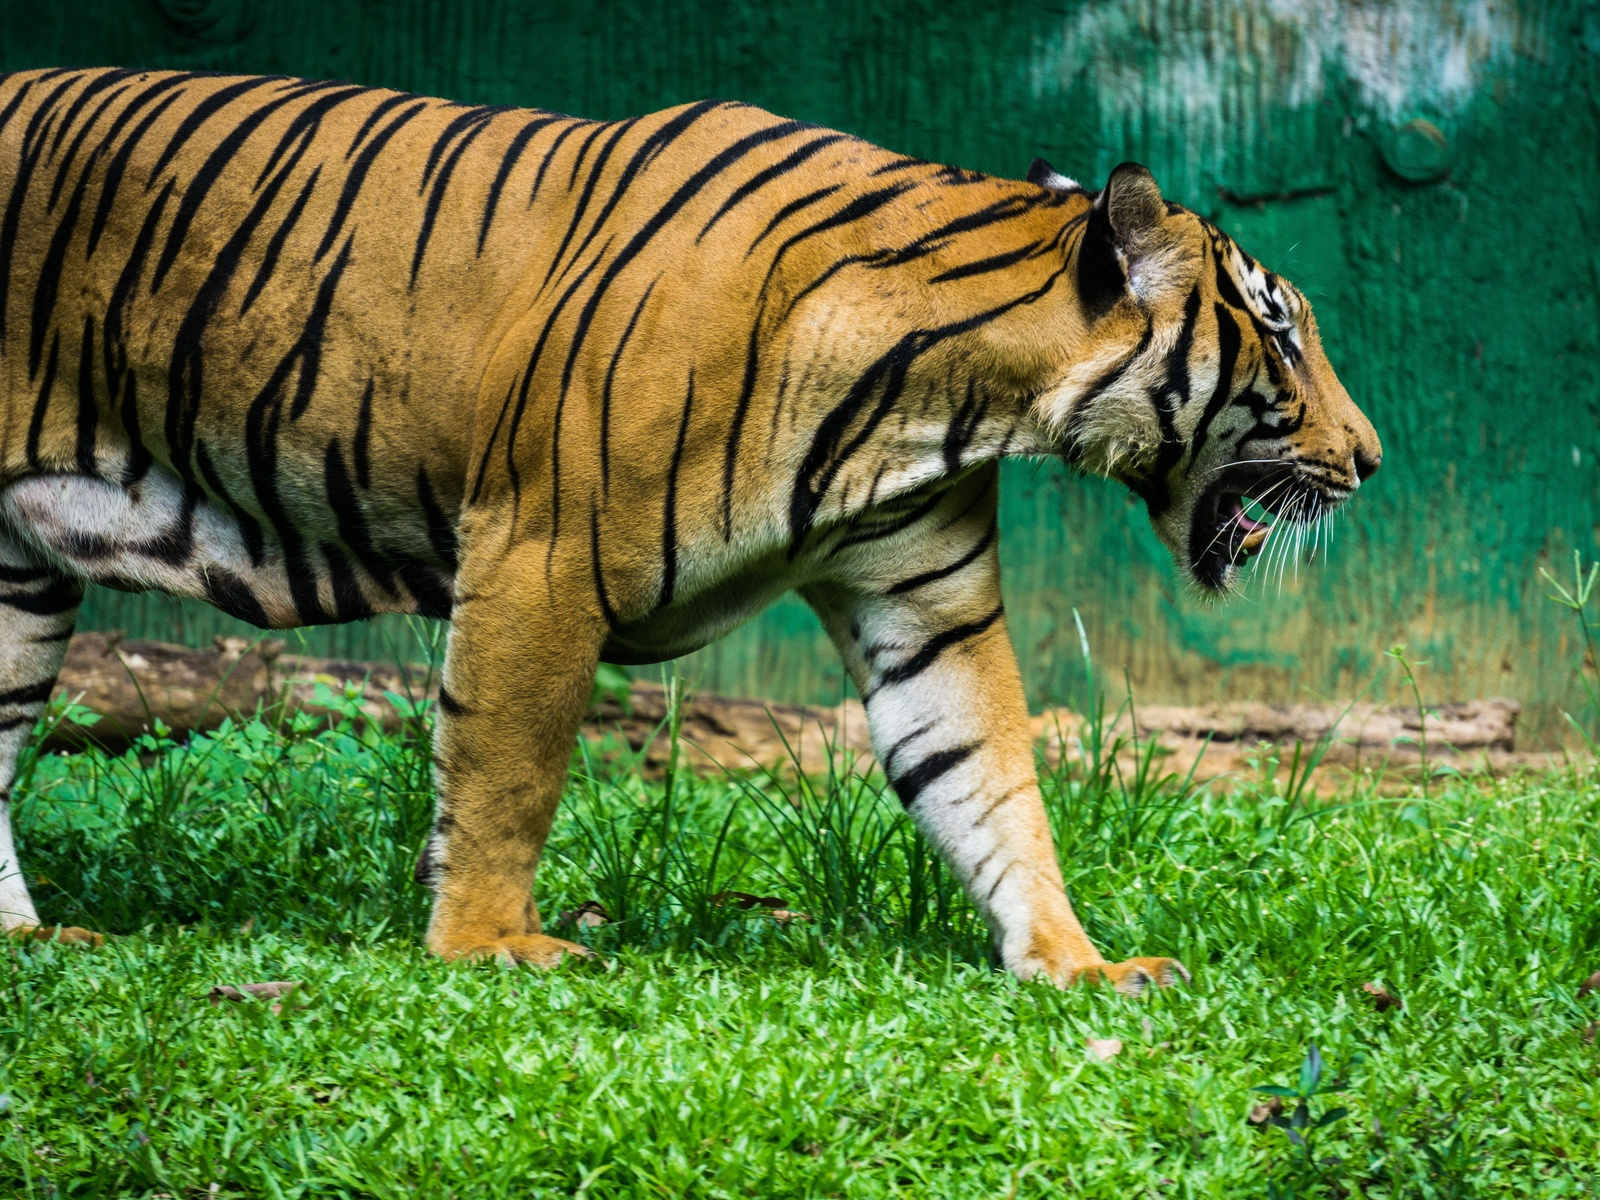 тигр, клыки, трава, животные